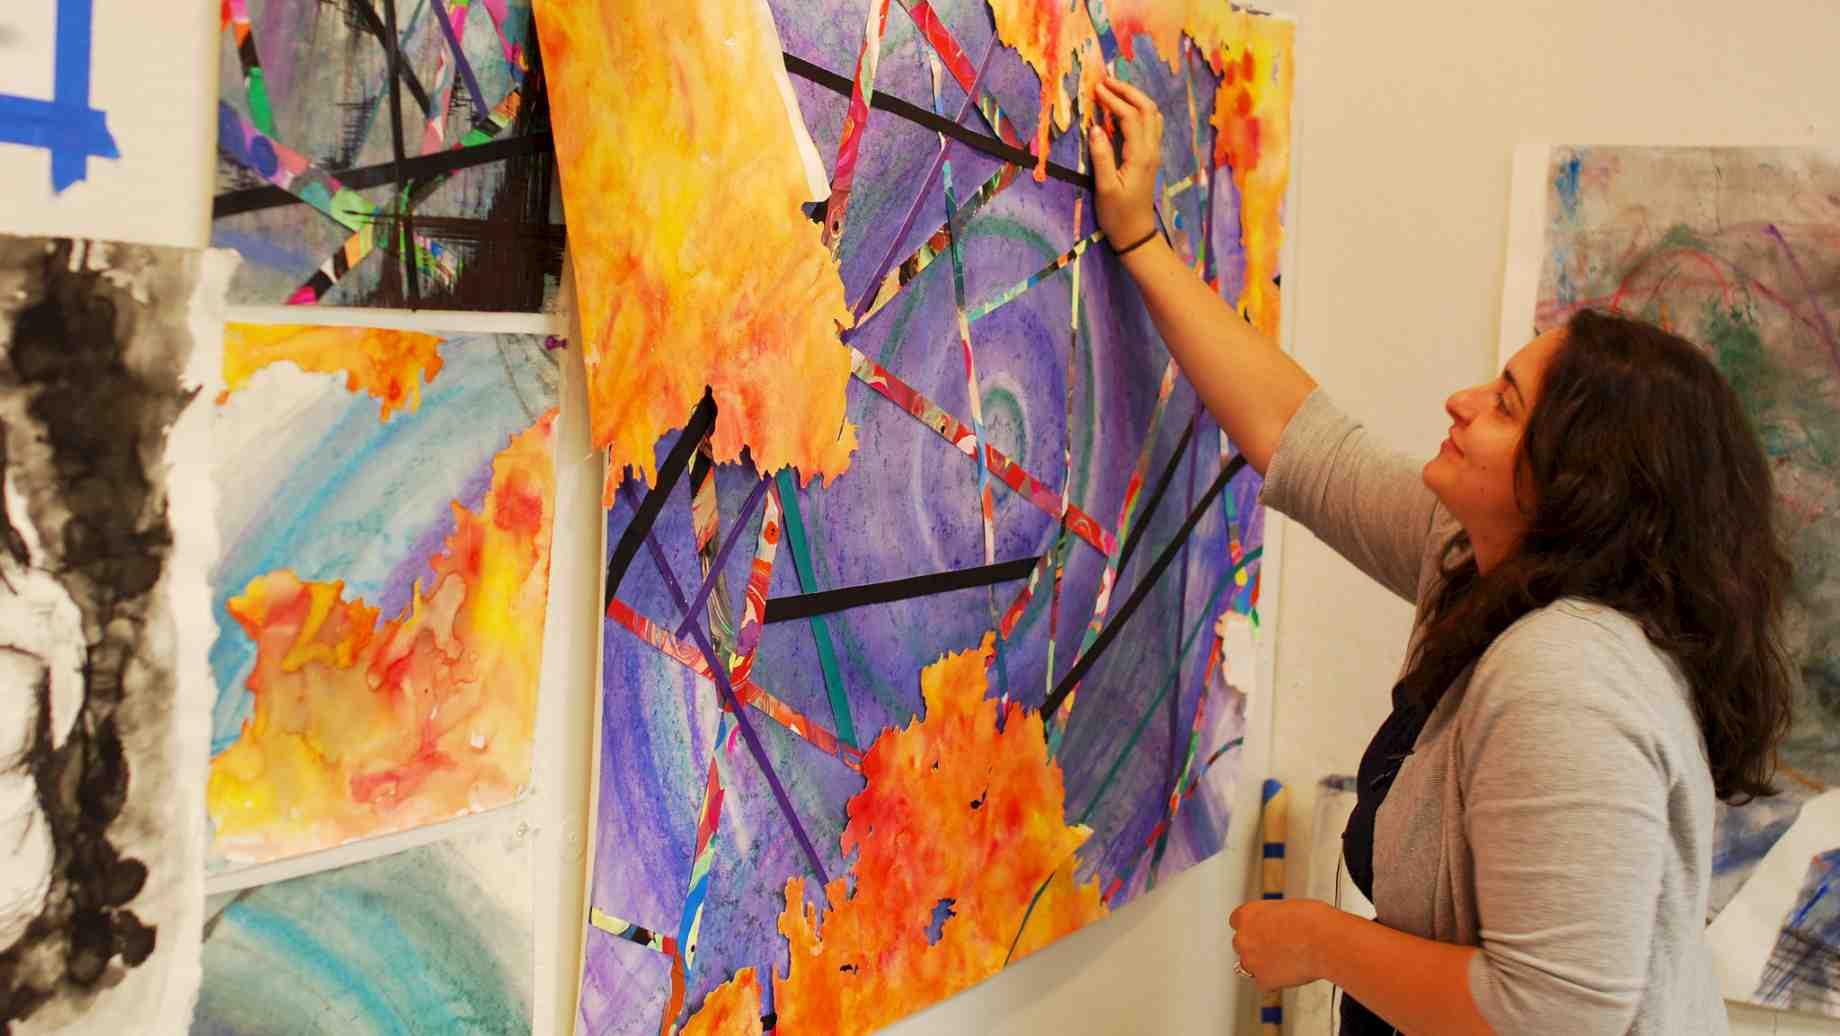 summer studio classes art education programs degrees school